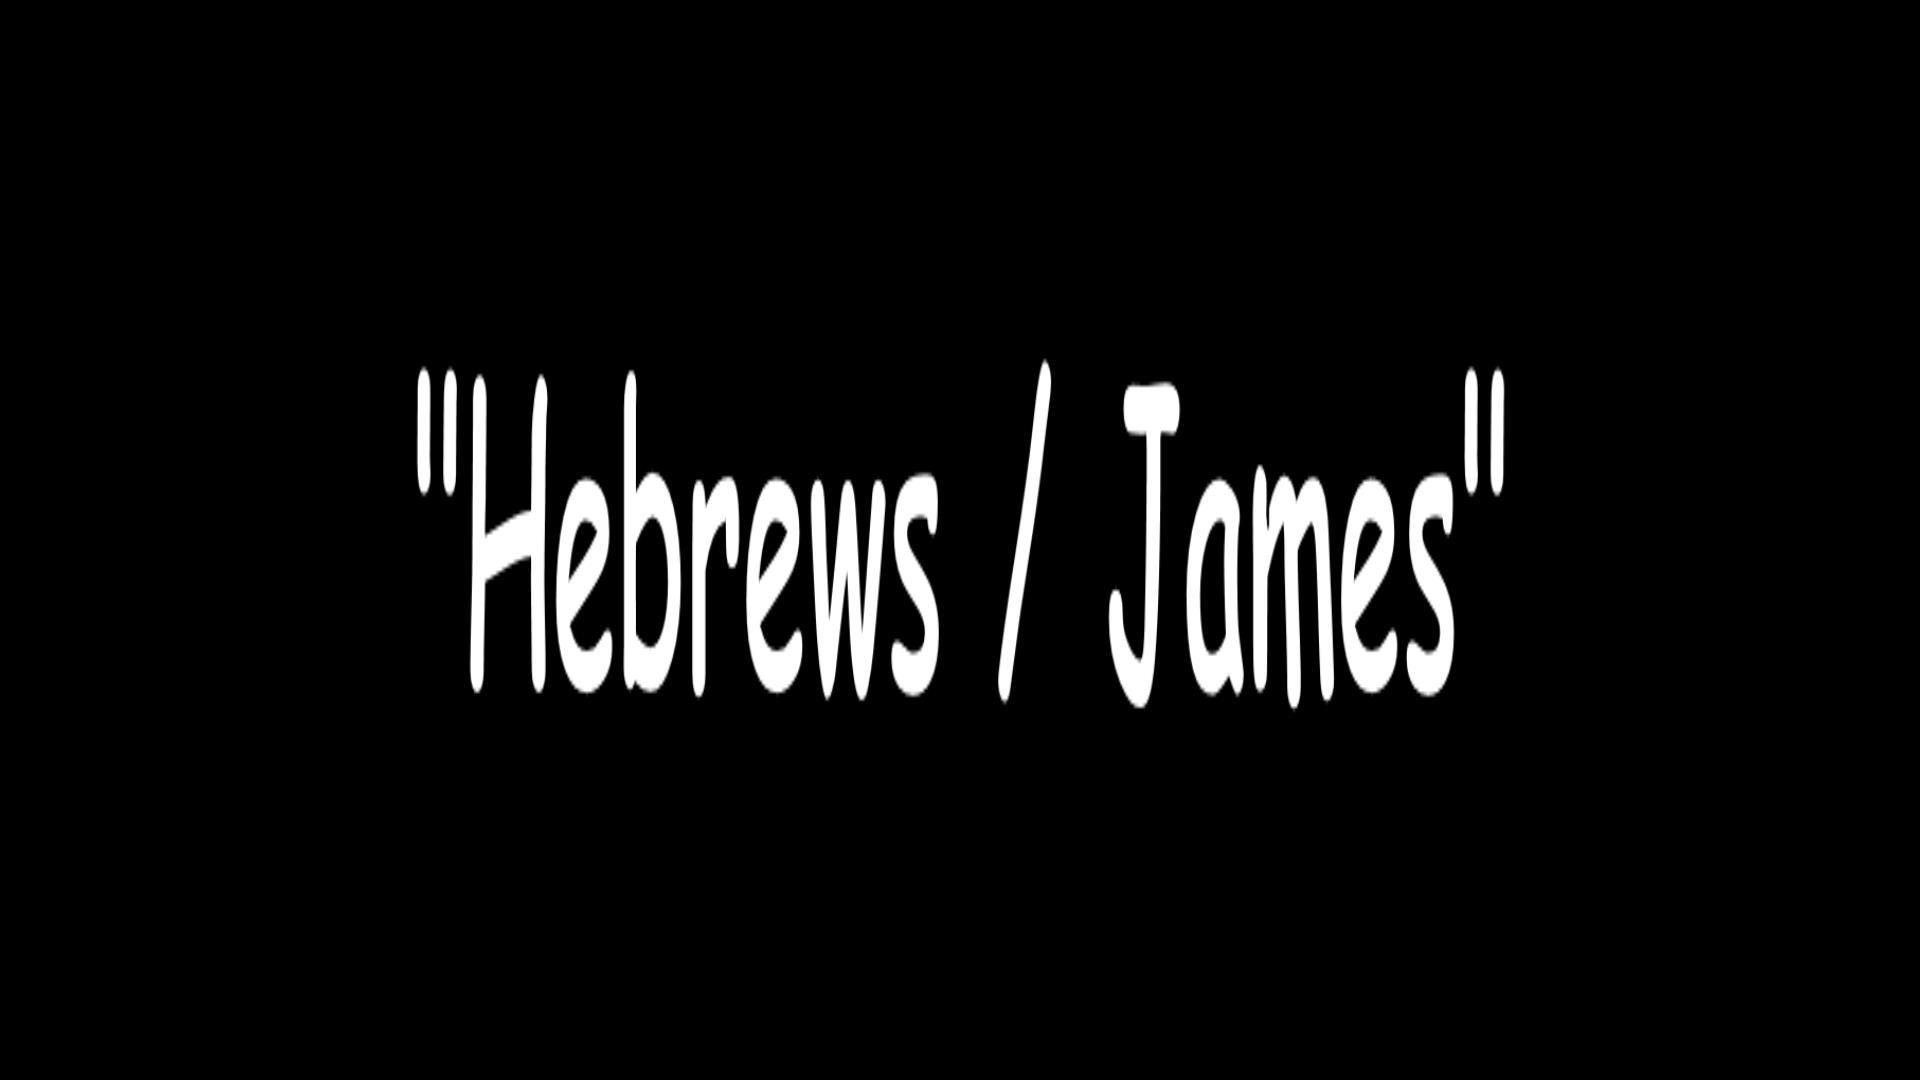 Hebrews / James